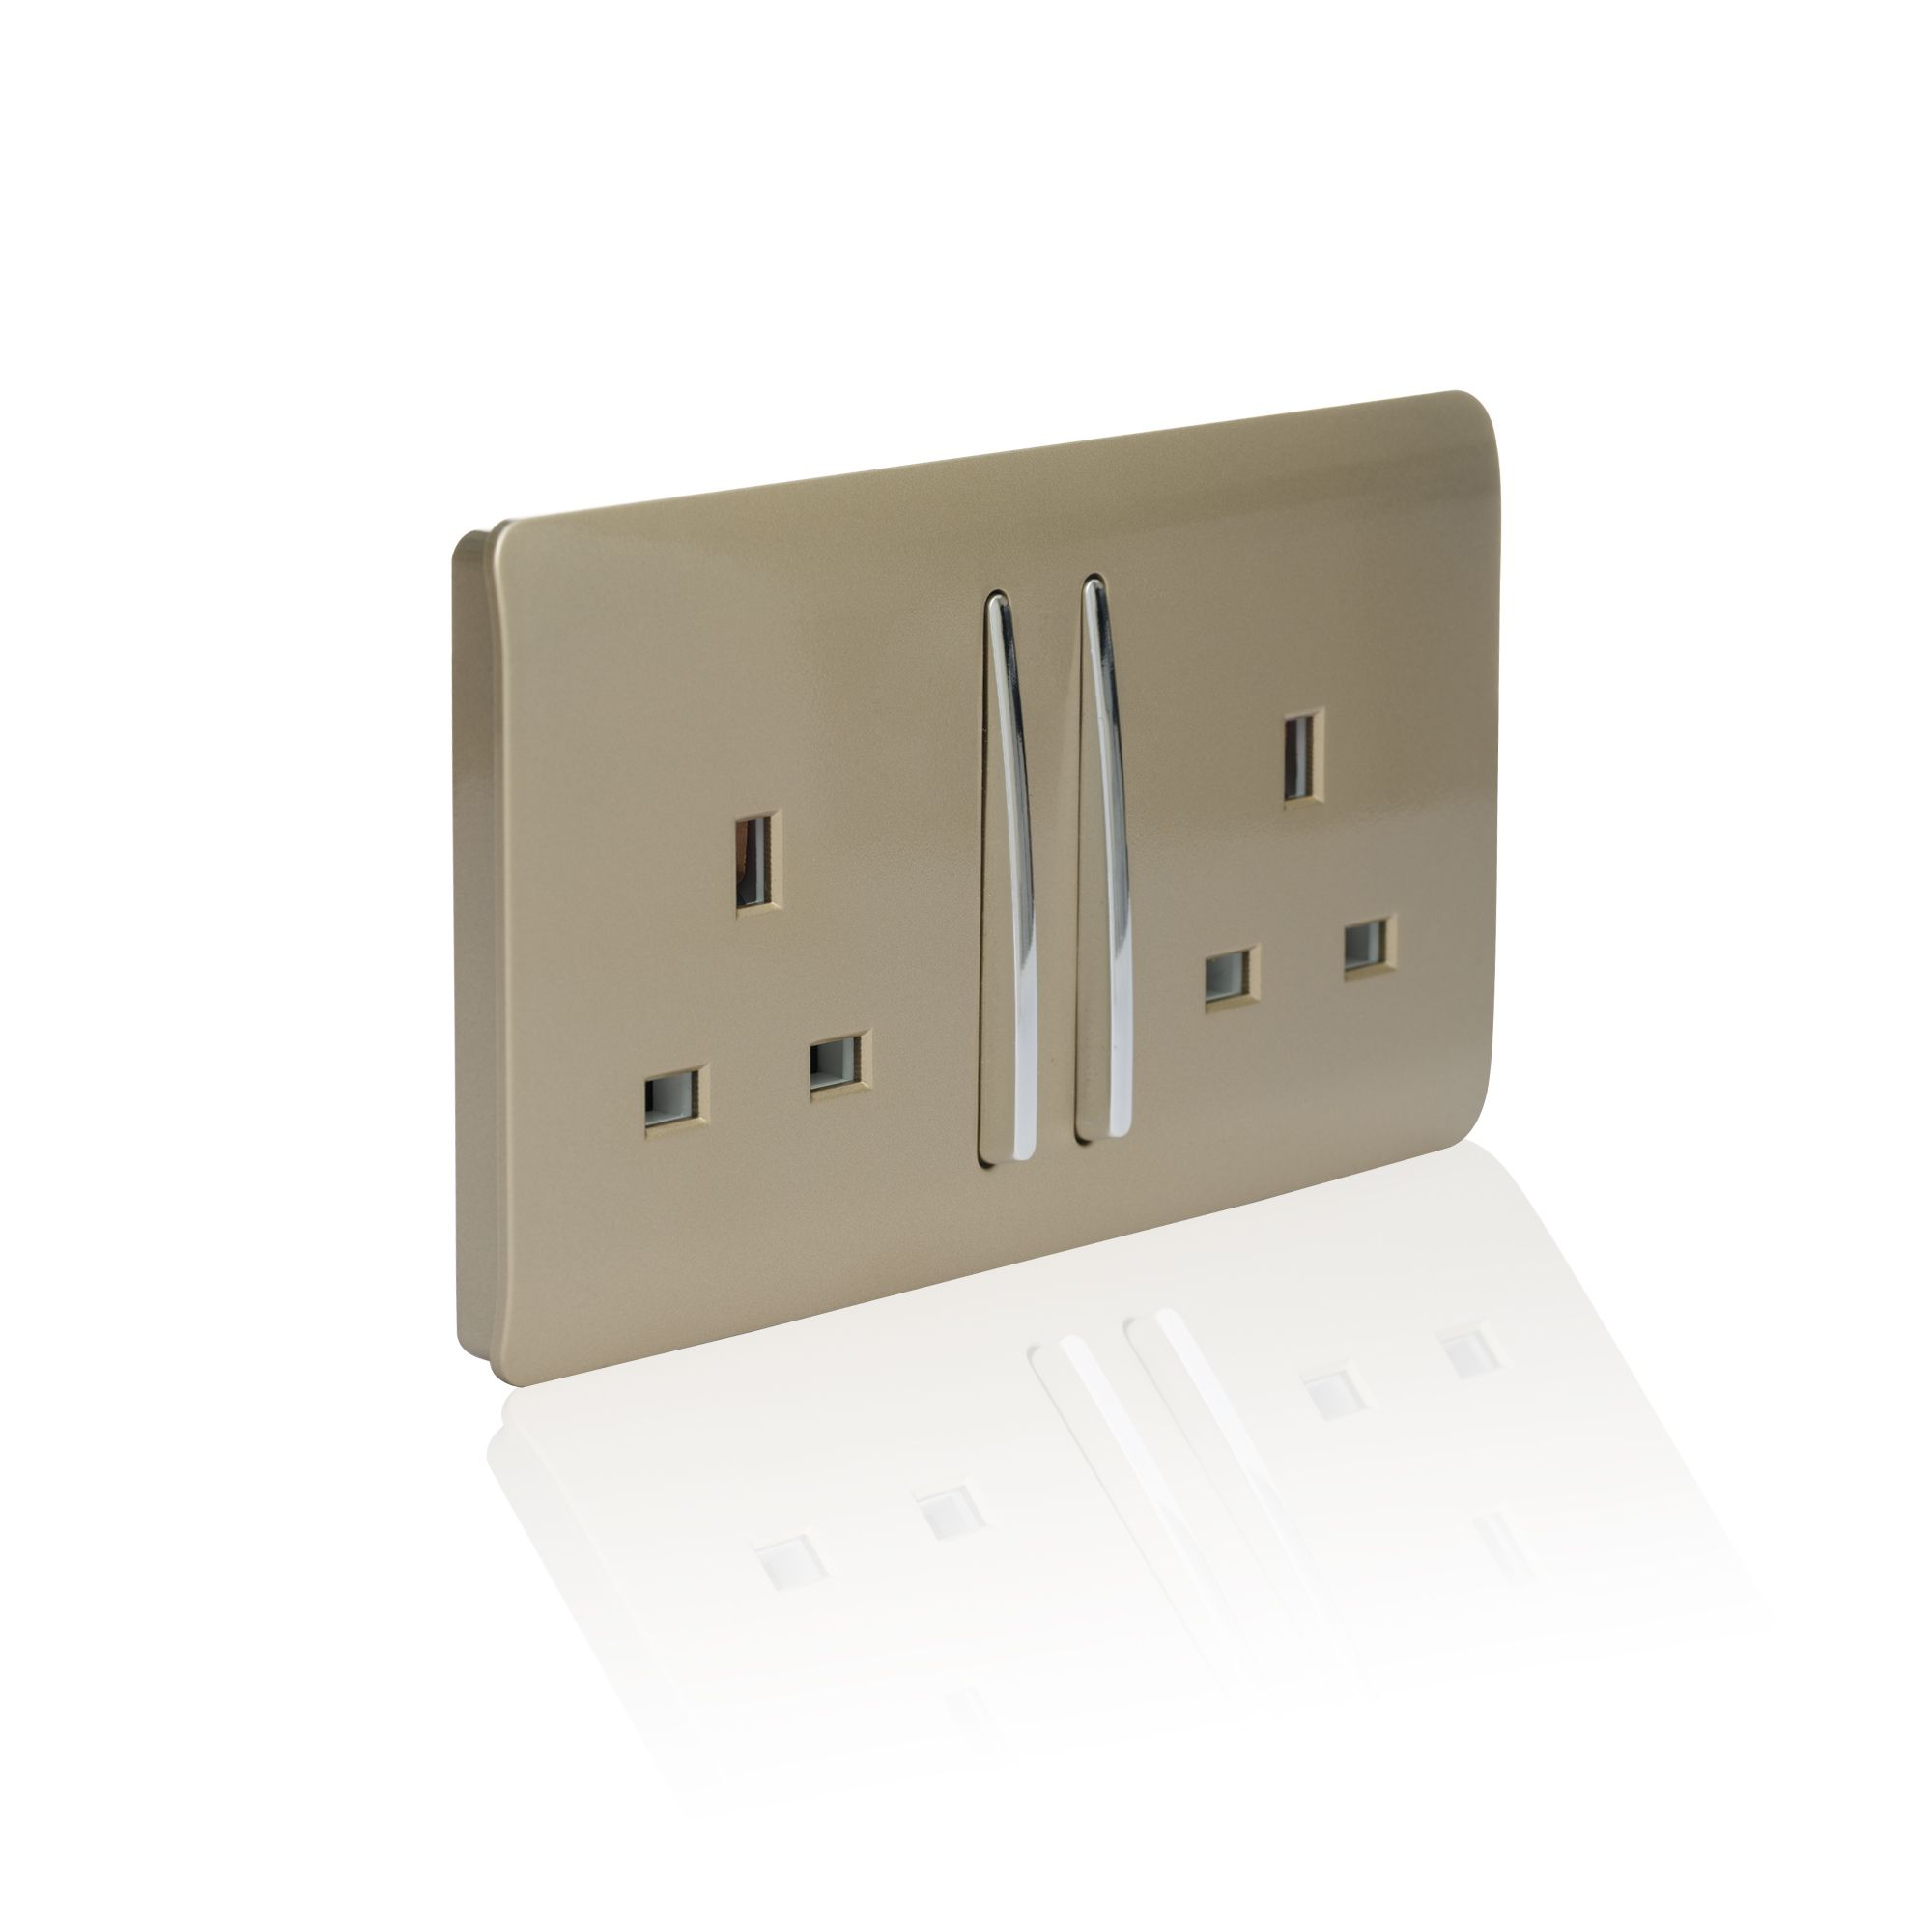 Trendi Switch Our Decorative Designer Retro Light Switch Plug